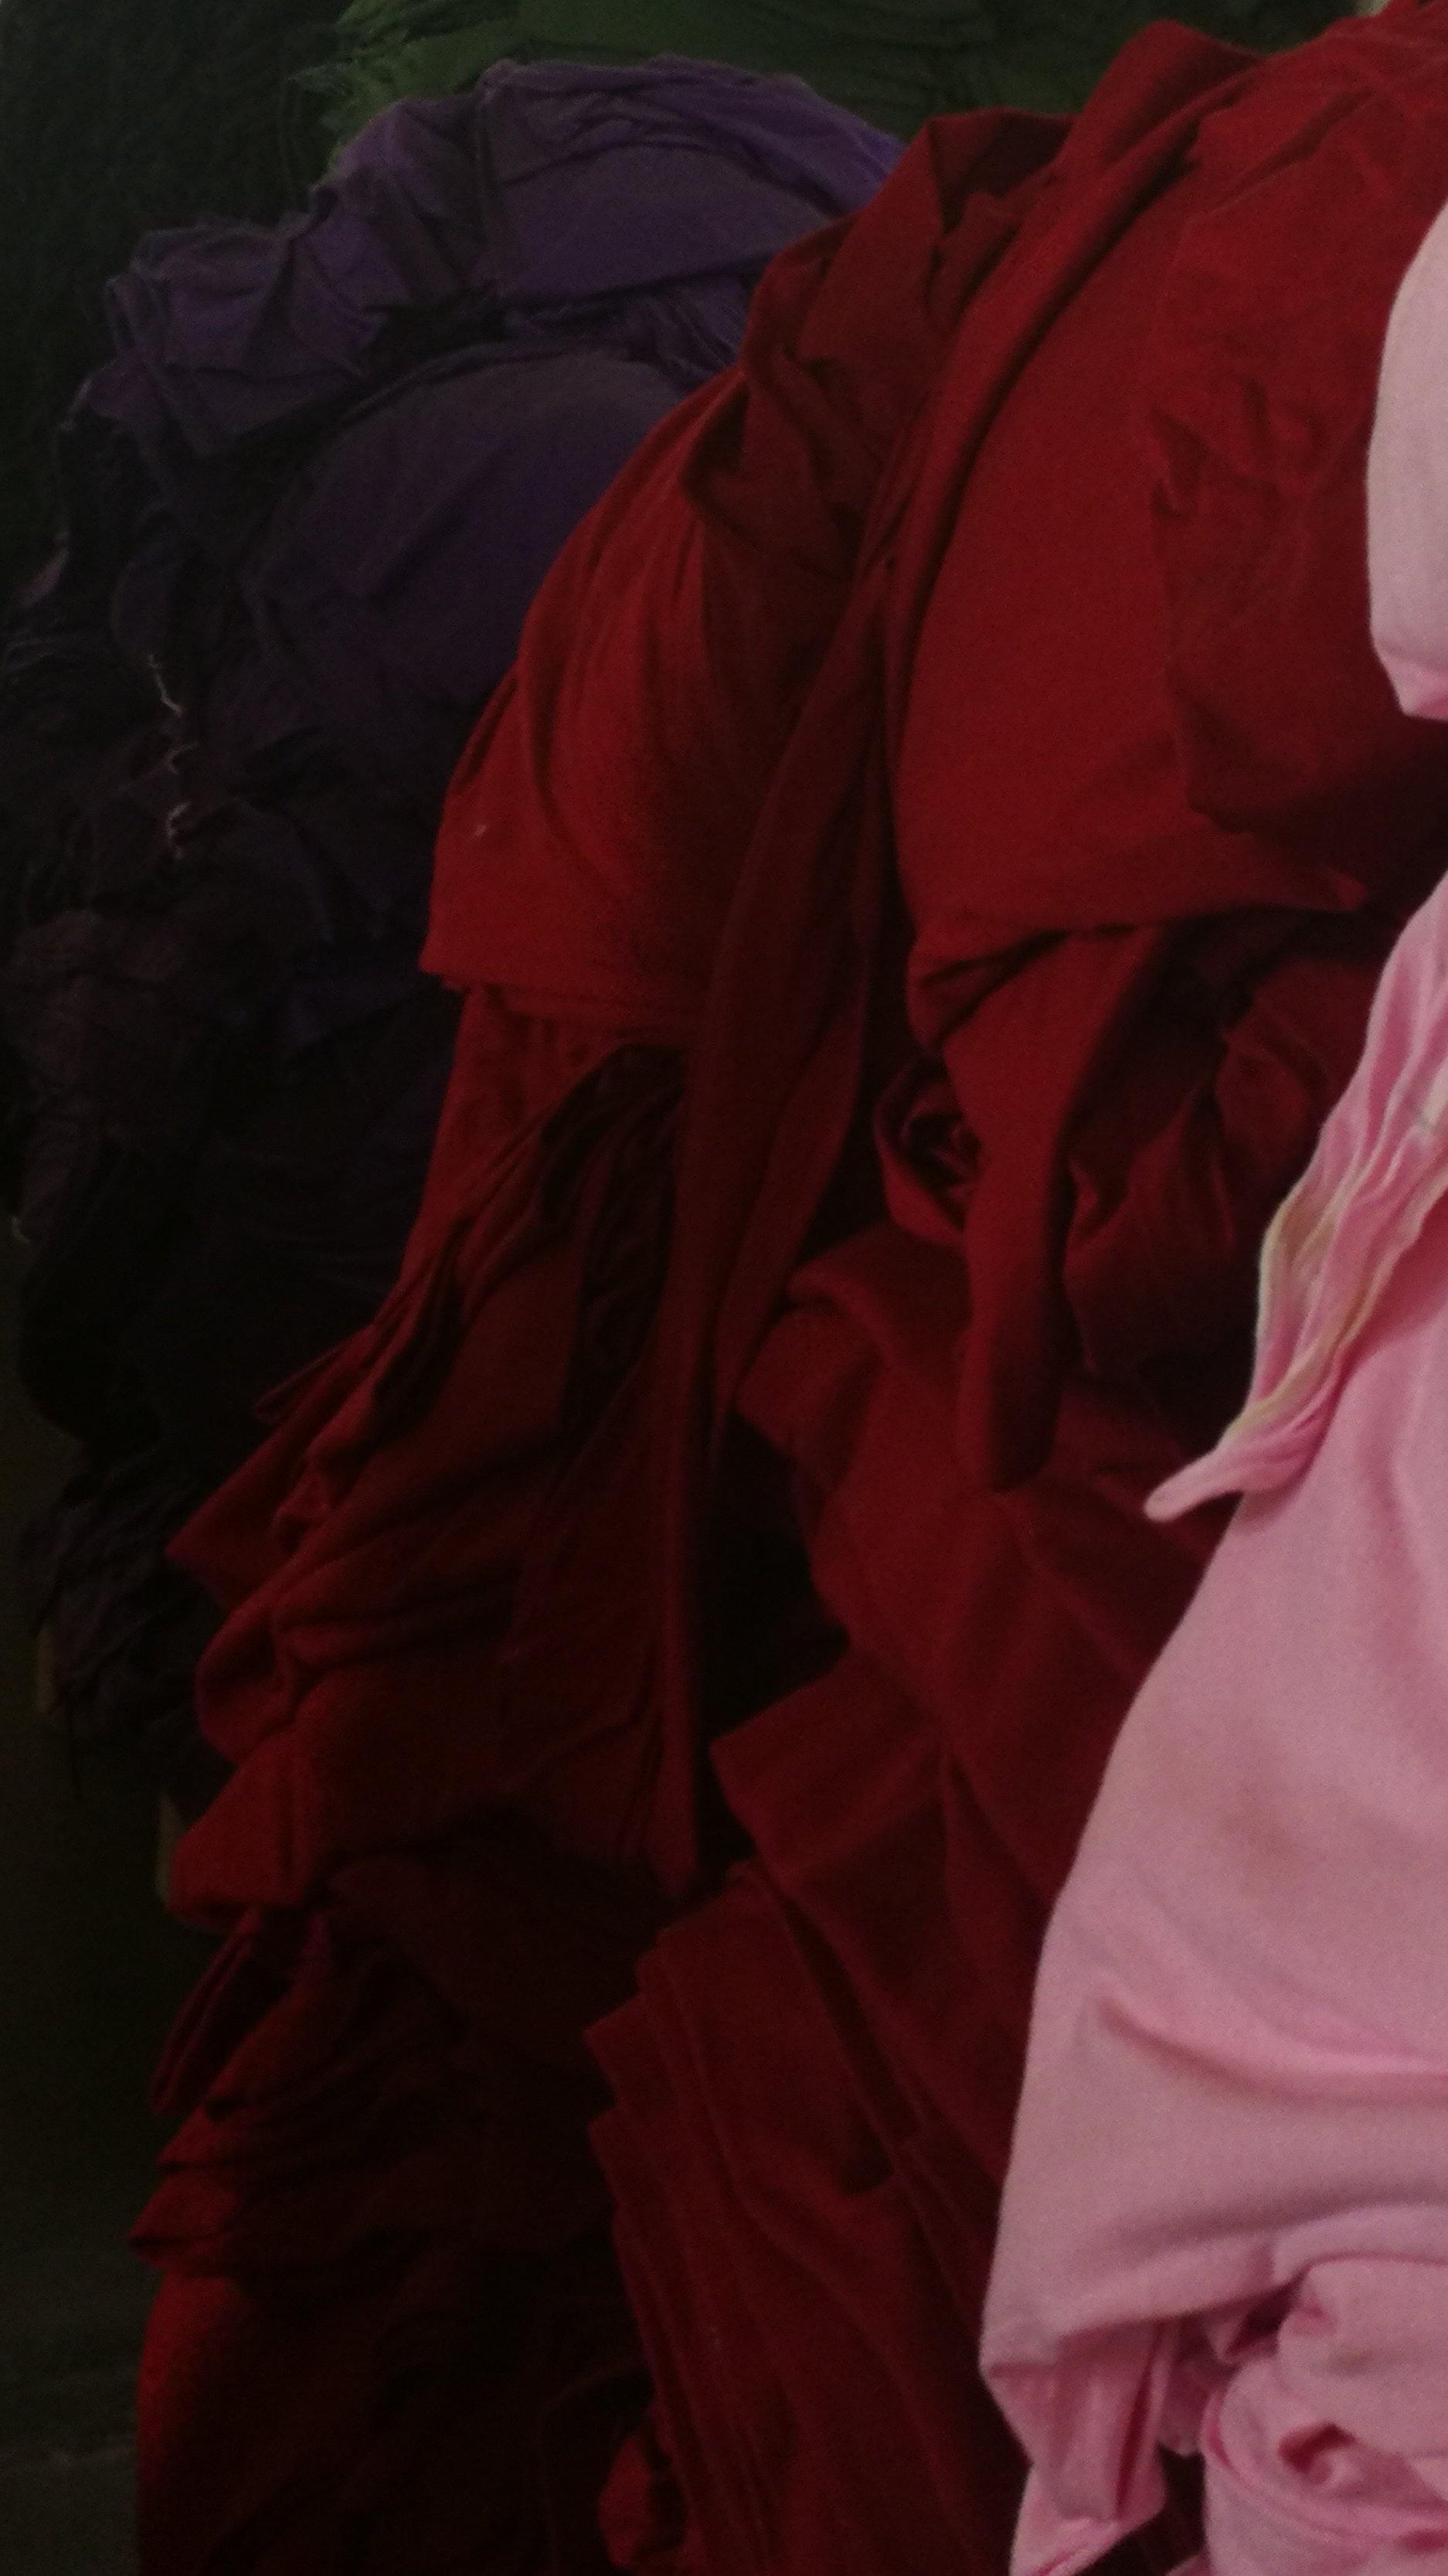 Ökologisch gefärbte Stoffe    Eco-friendly dyed fabrics